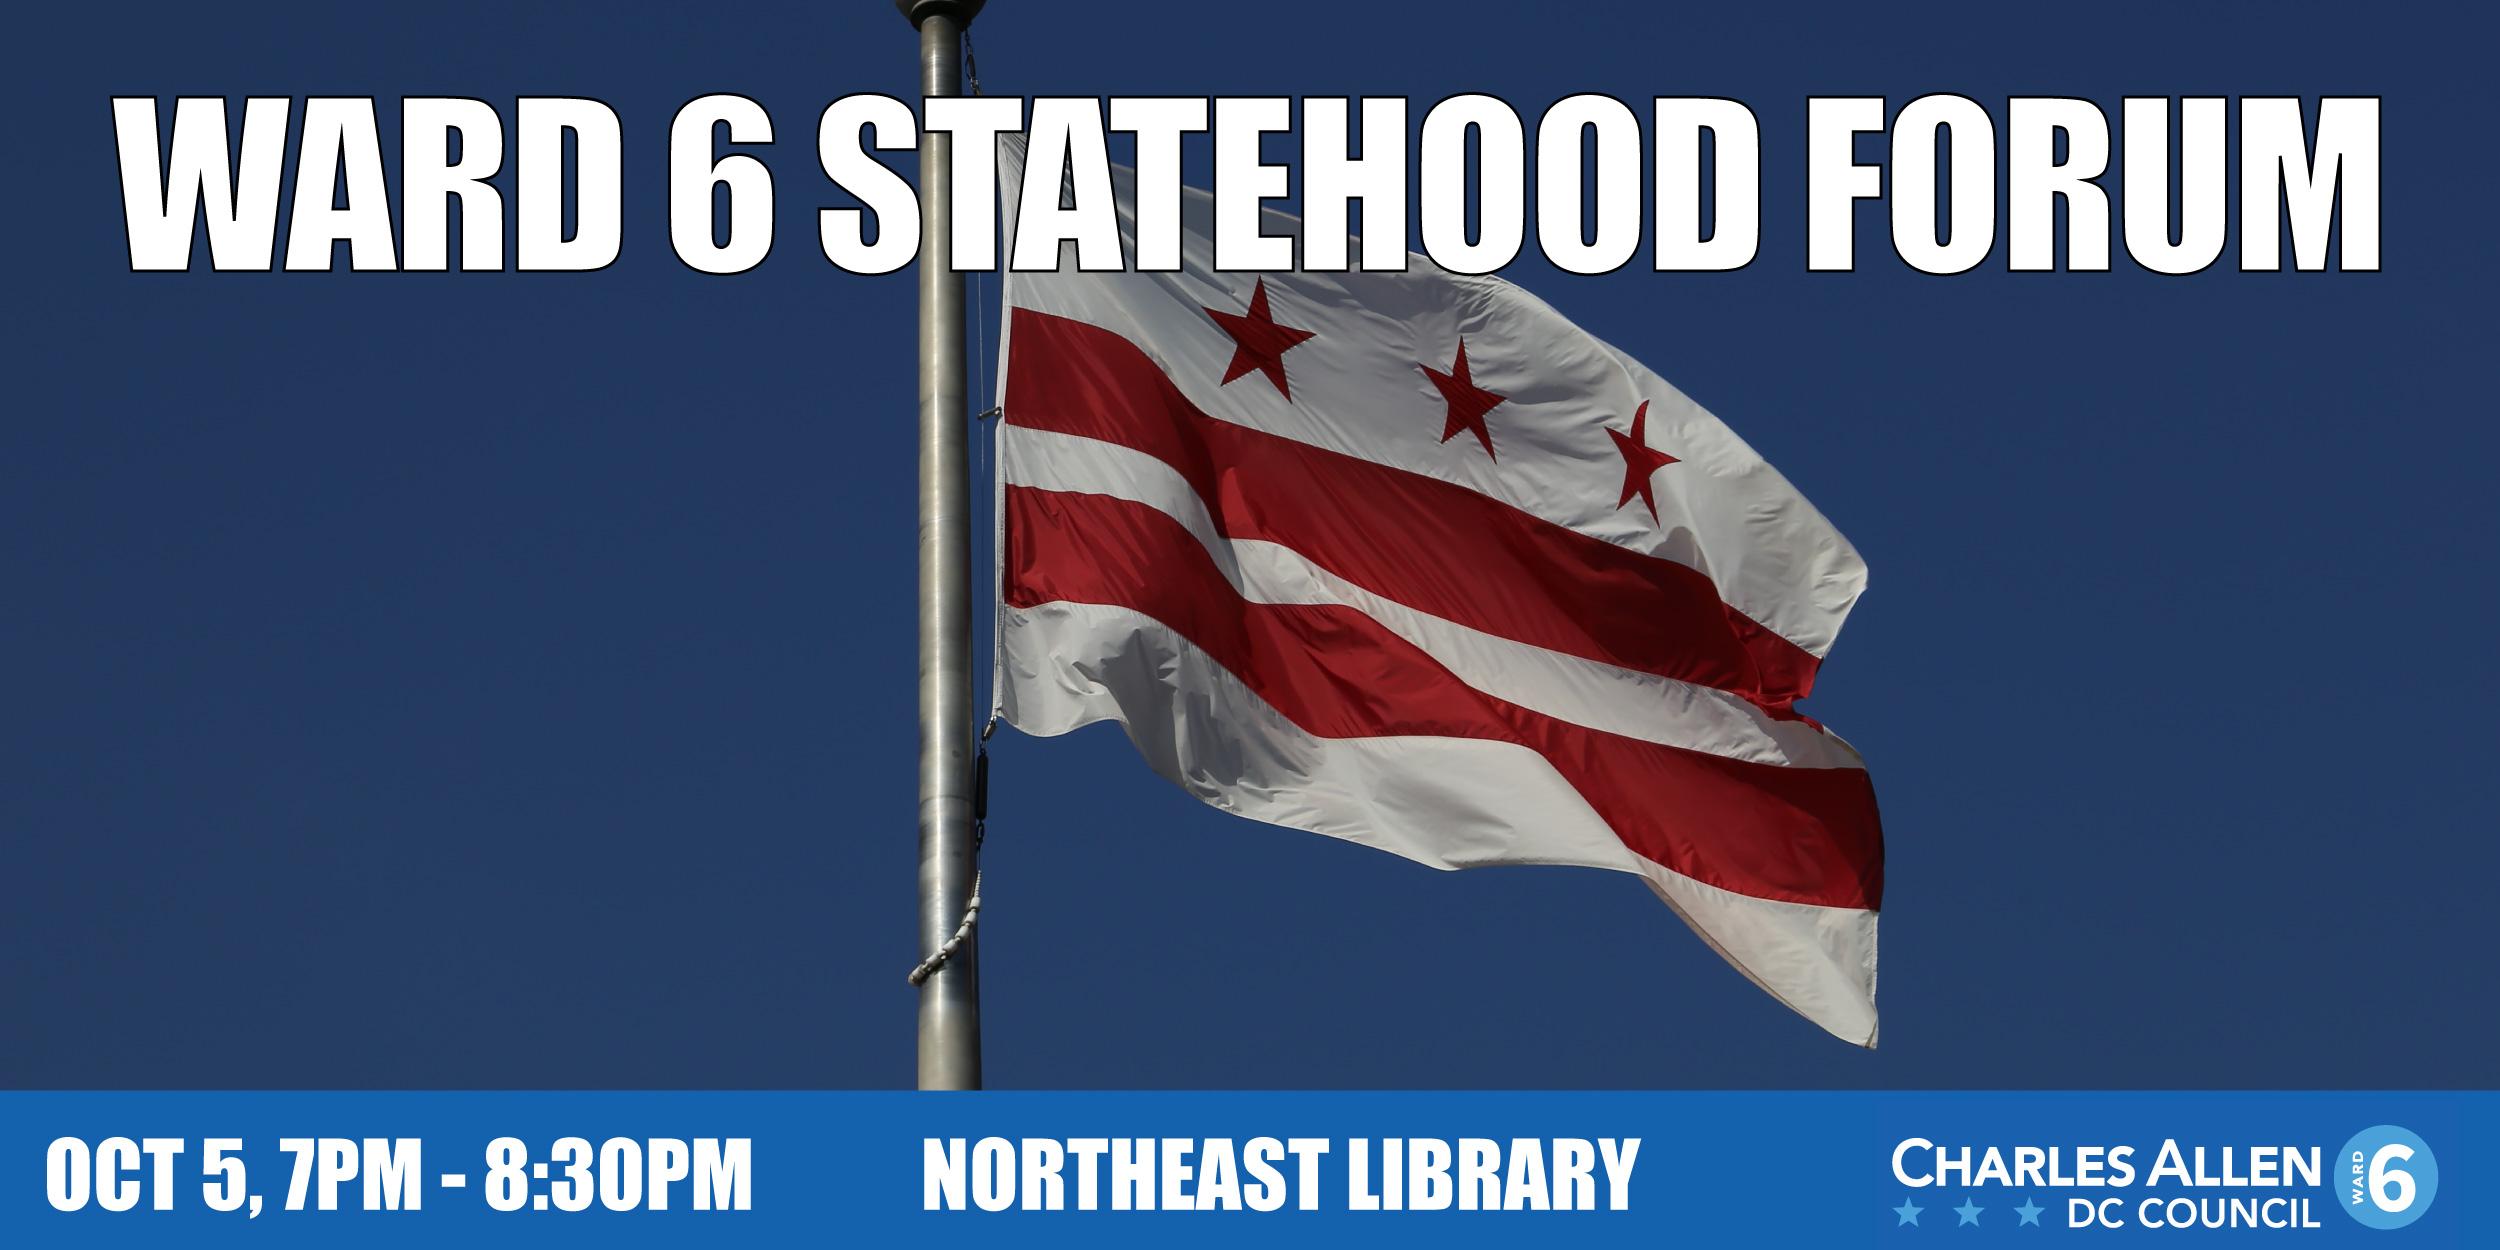 W6-Statehood-Forum-rev2.jpg